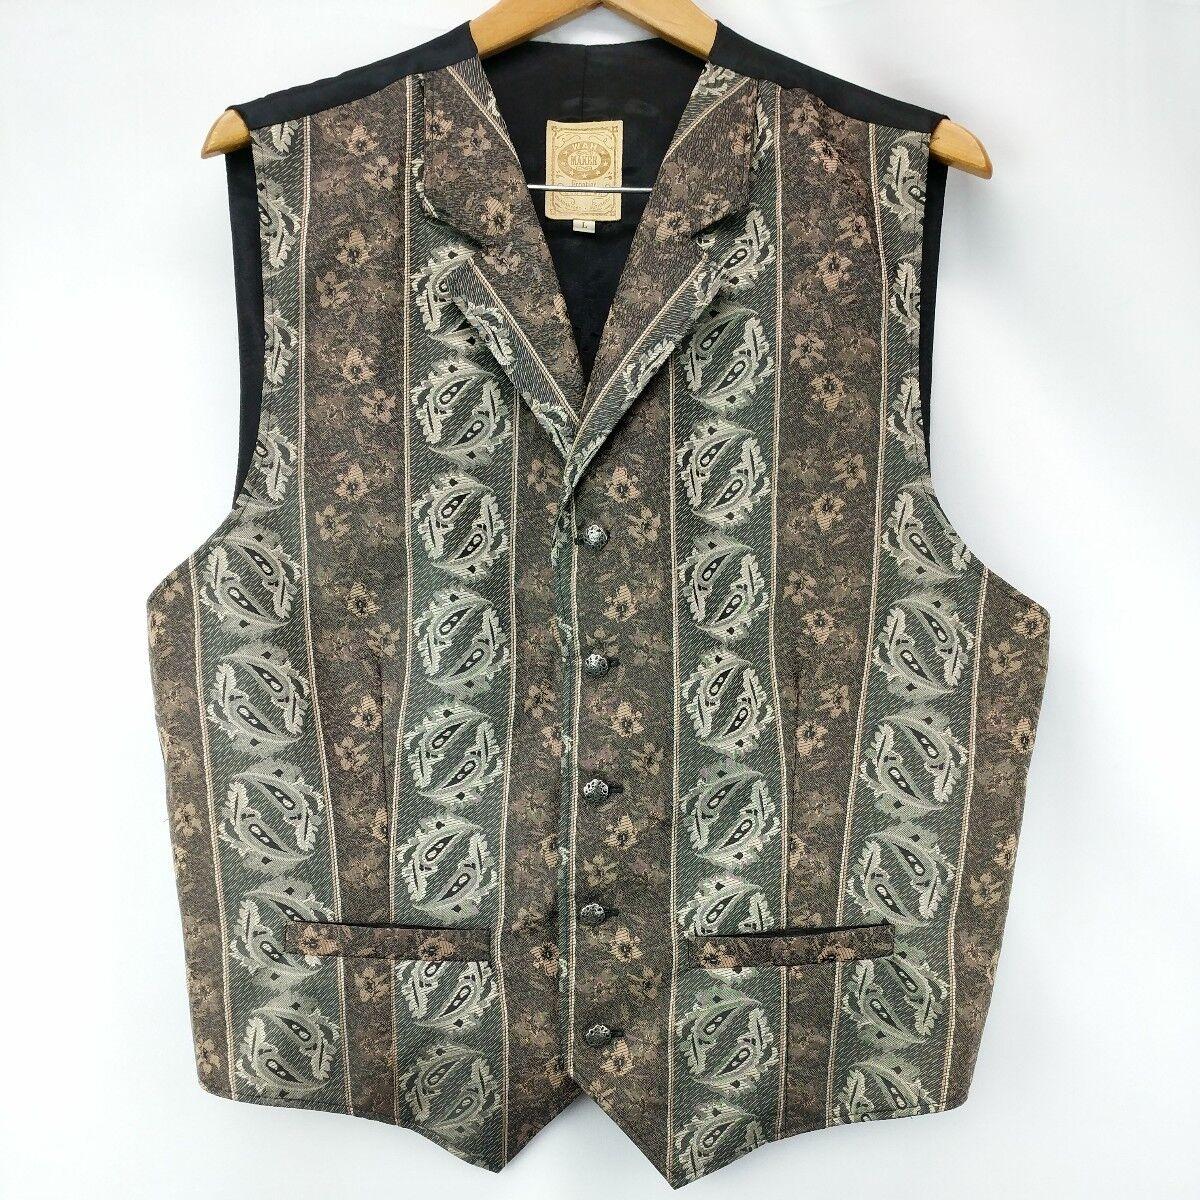 Wah Maker mens Größe Large vest Frontier clothing western reenactment  A50-8